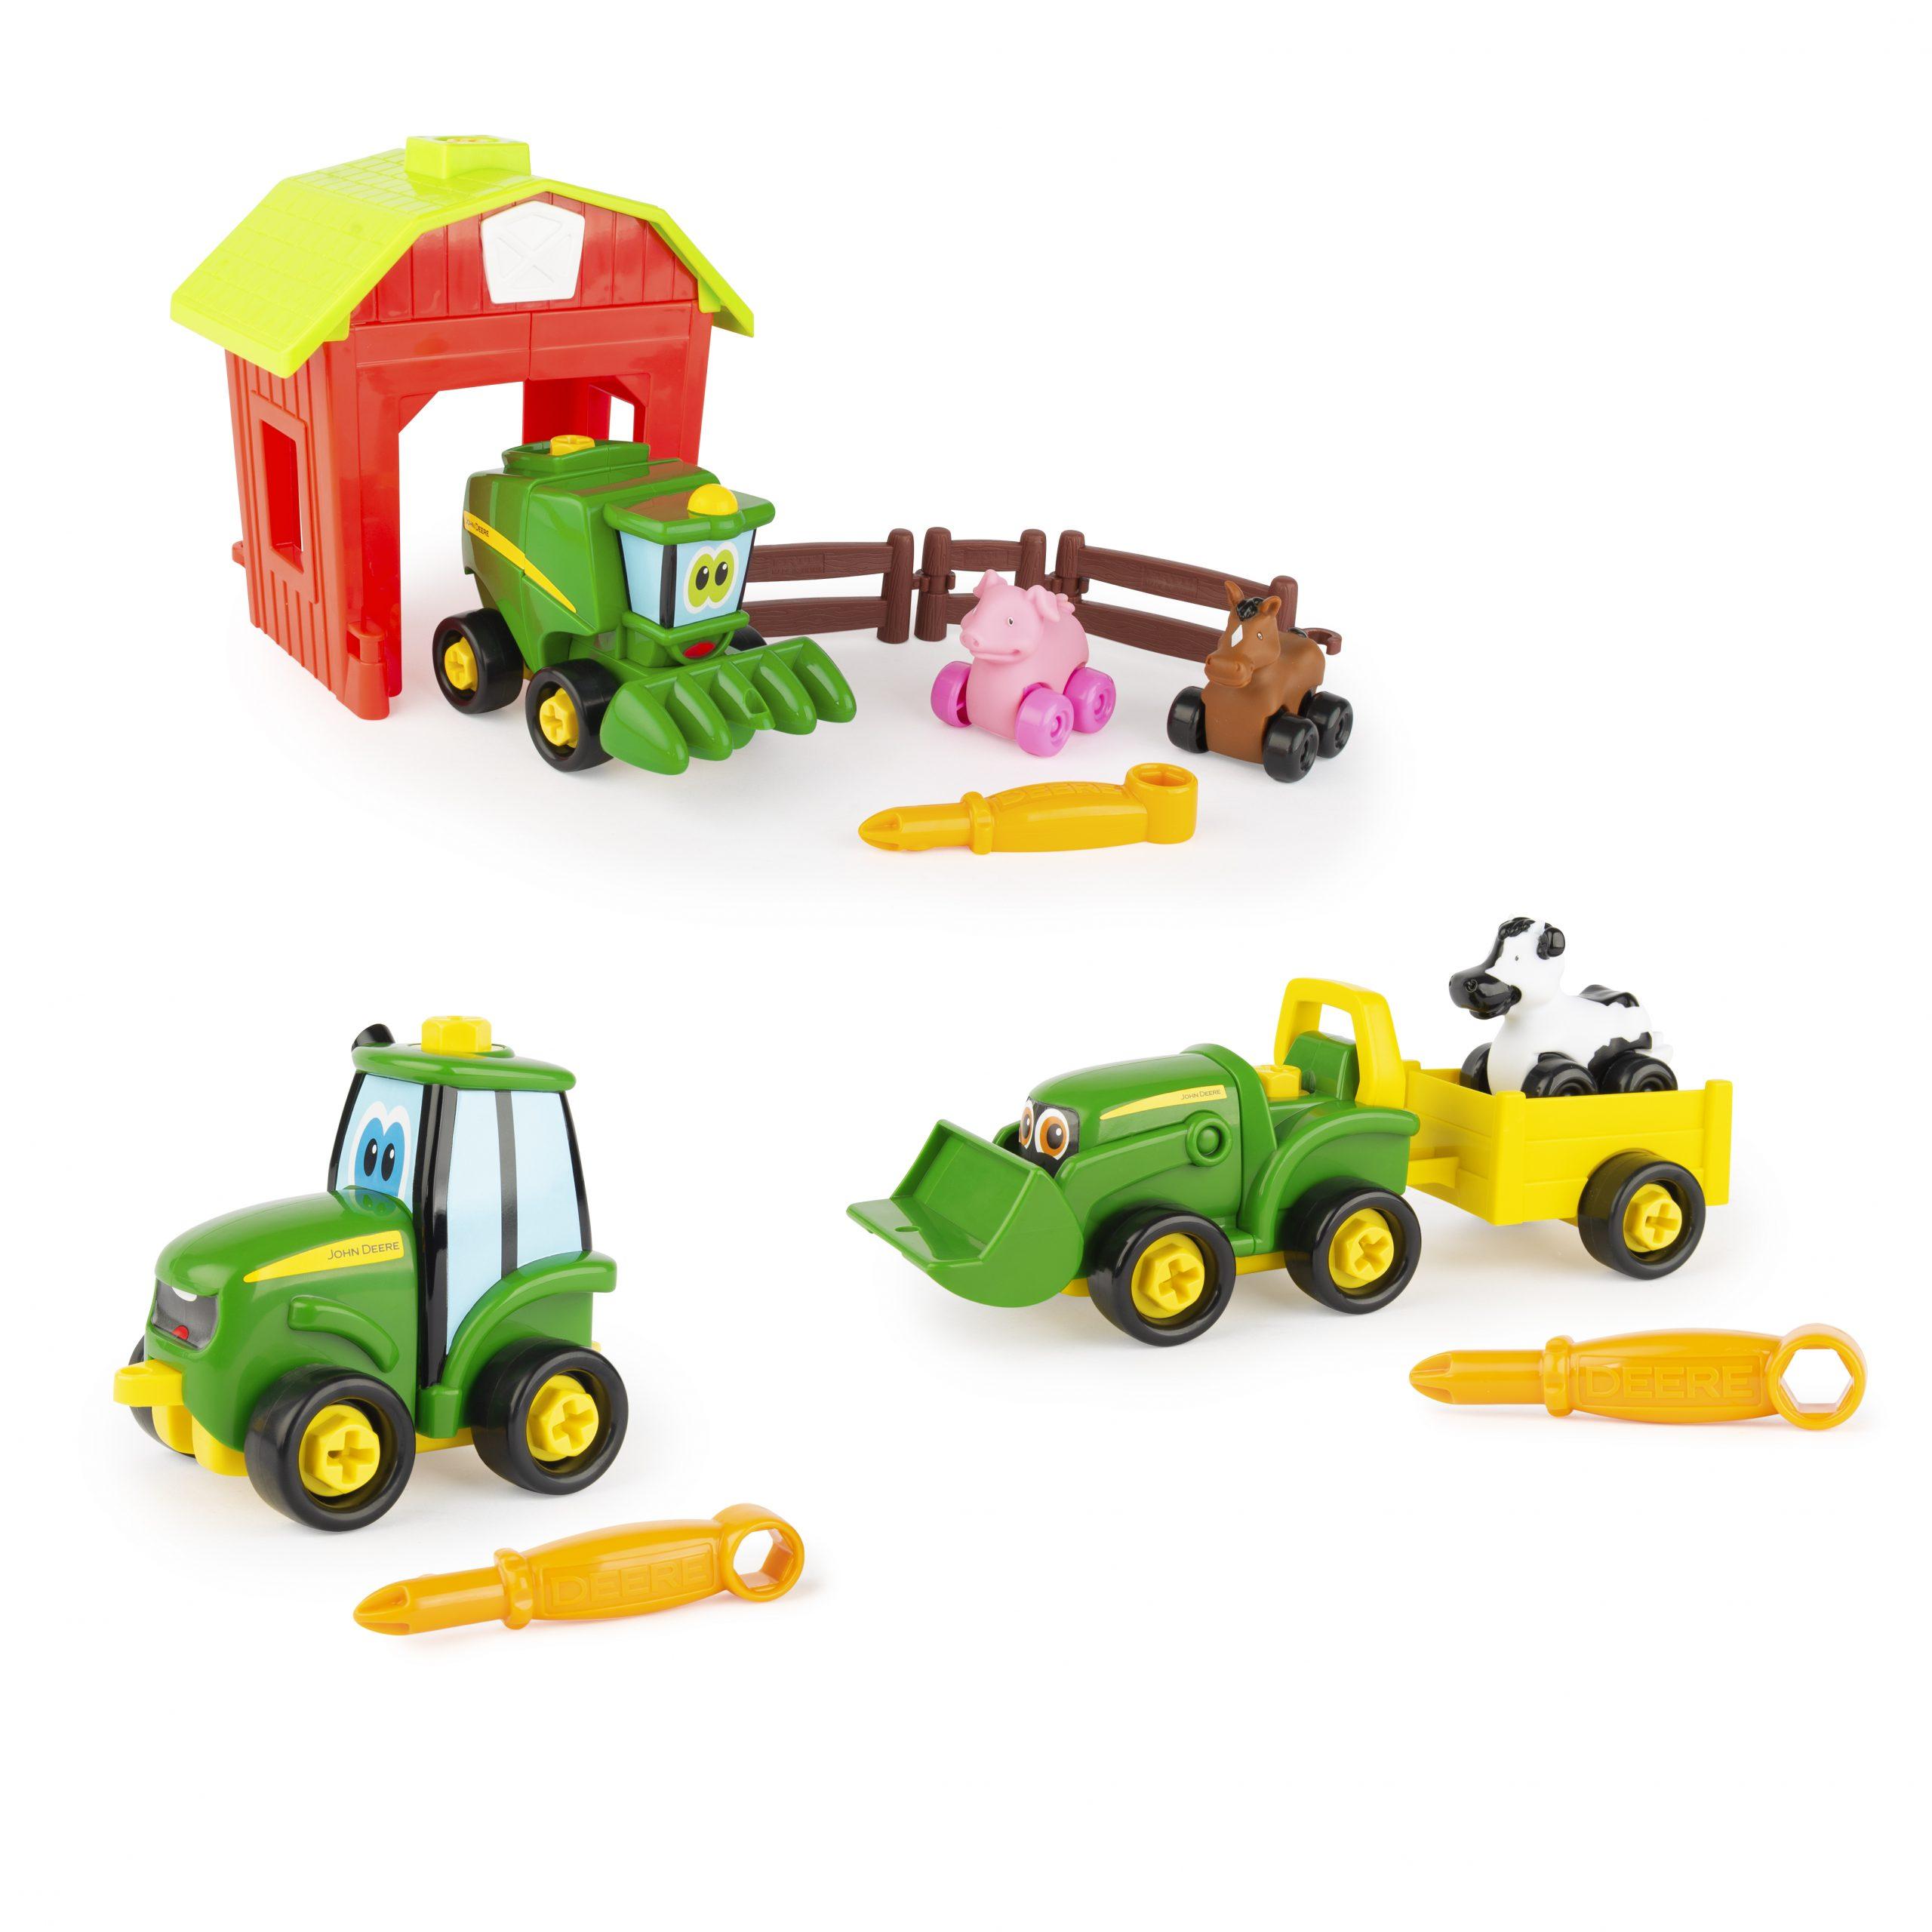 TOMY John Deere Build-A-Buddy Value Bundle 3-in-1 Toy Set